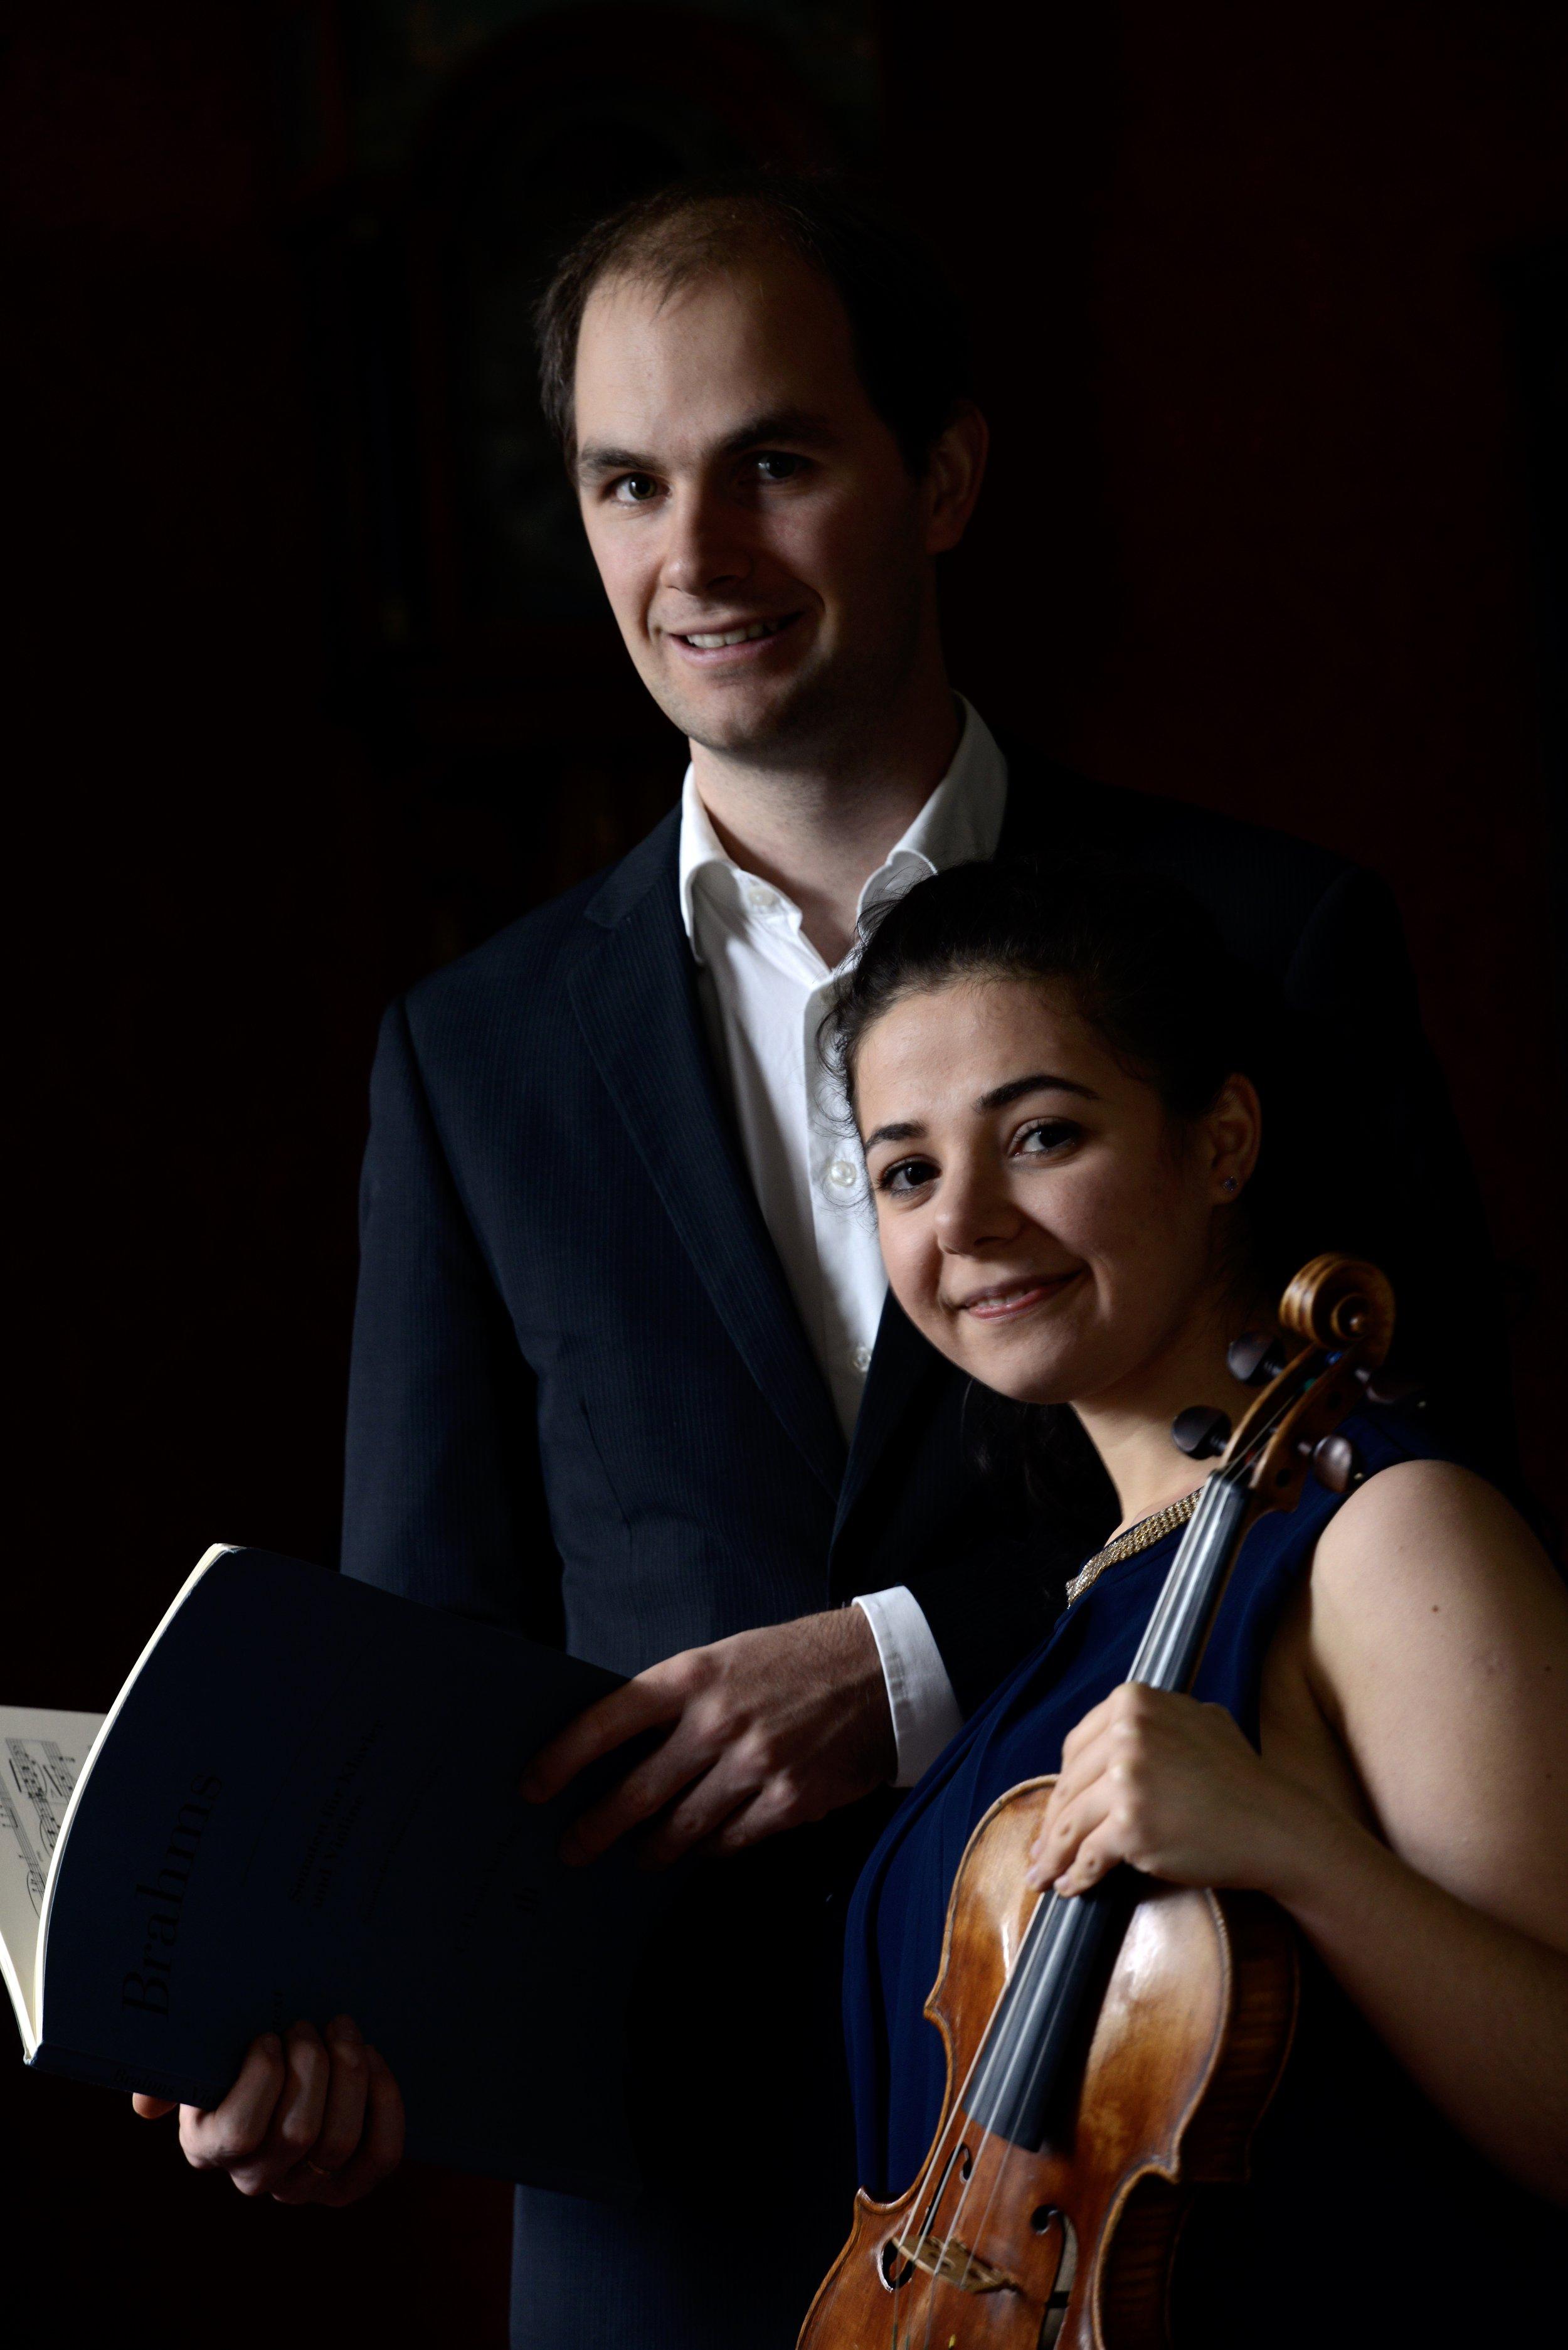 Robert Poortinga and Meri Khojayan, The Netherlands and Armenia